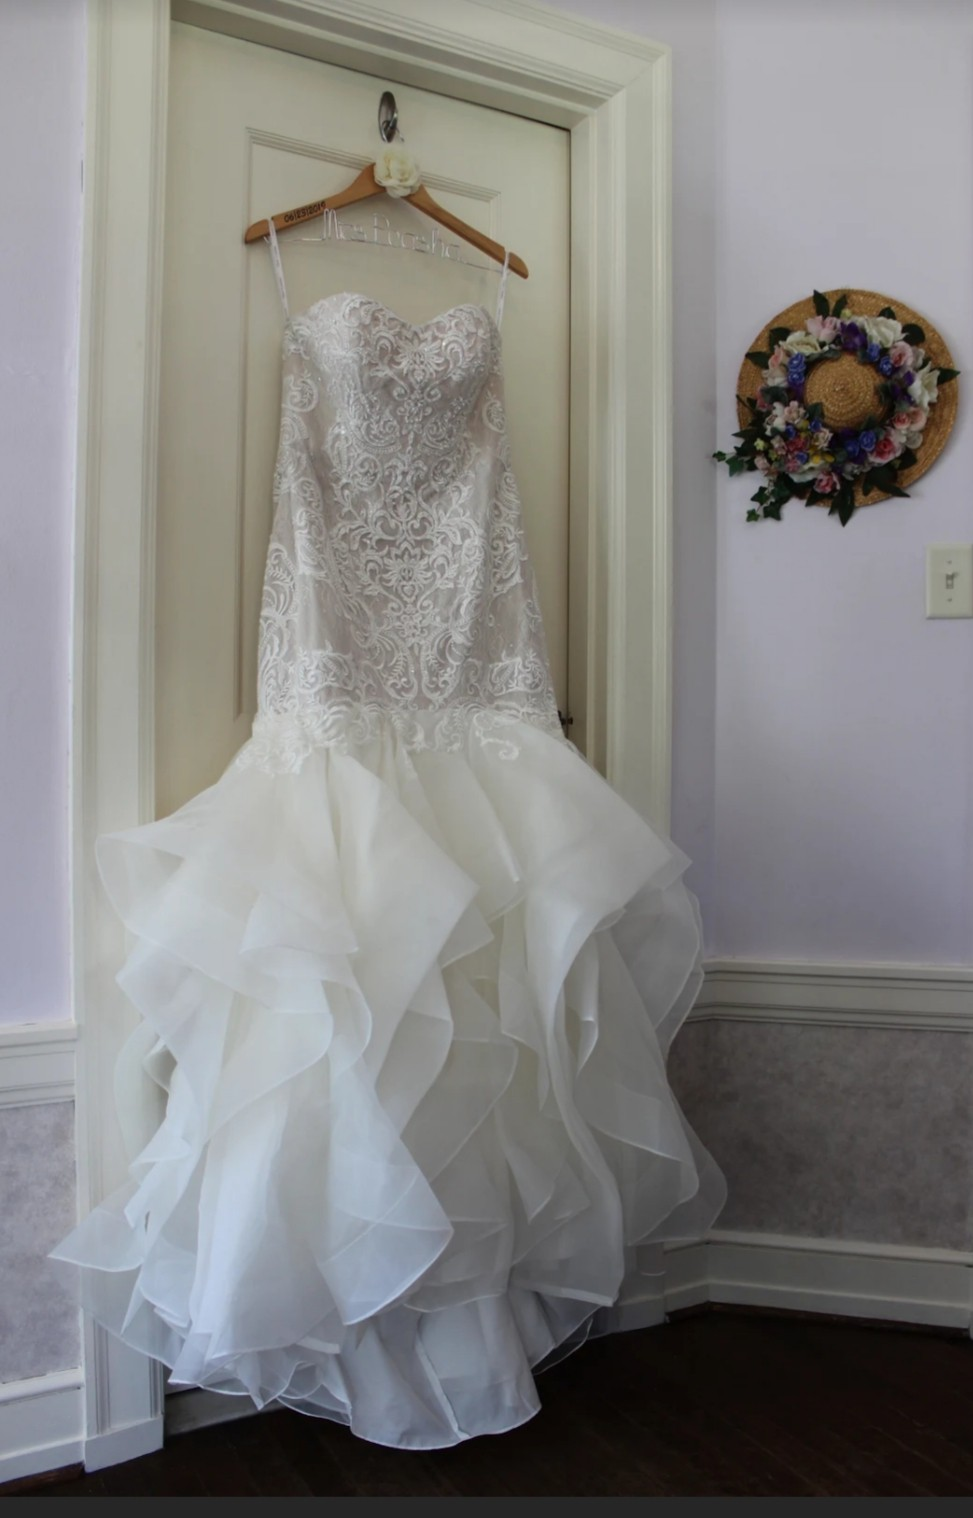 Oleg Cassini Scroll Lace Trumpet Wedding Dress Wedding Dress On Sale 41% Off